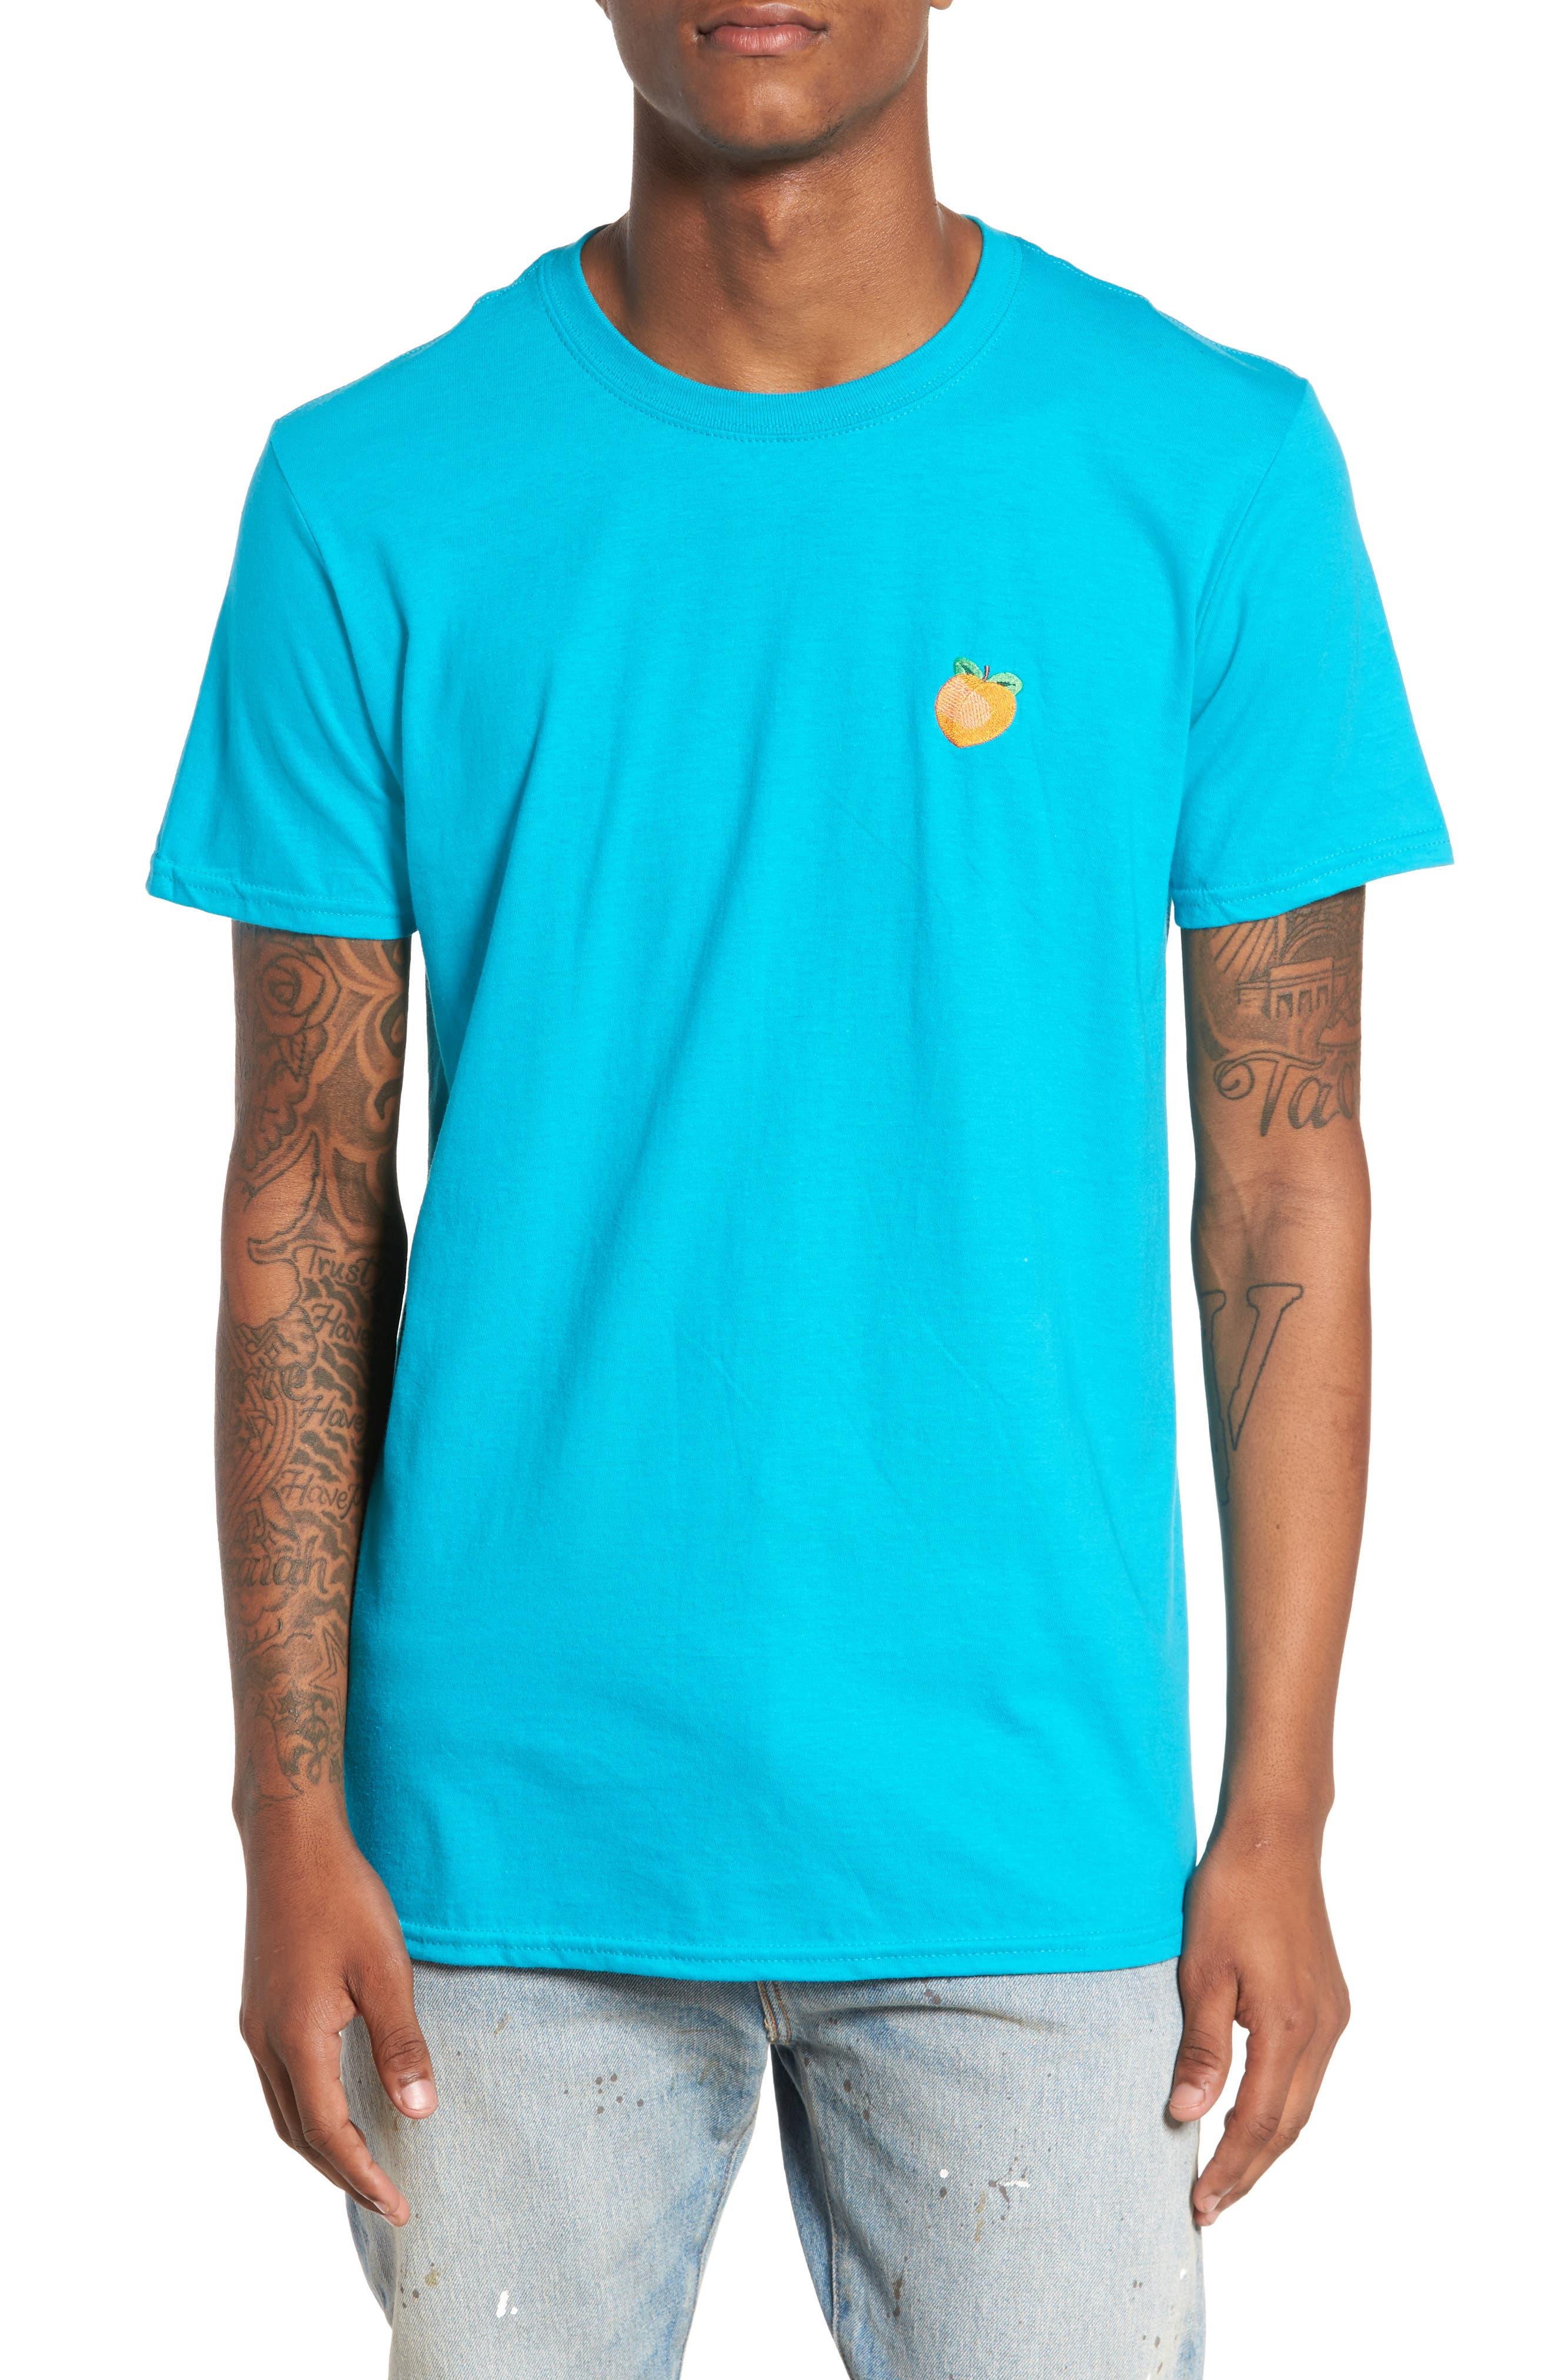 Embroidered Peach T-Shirt,                         Main,                         color, Teal Peach